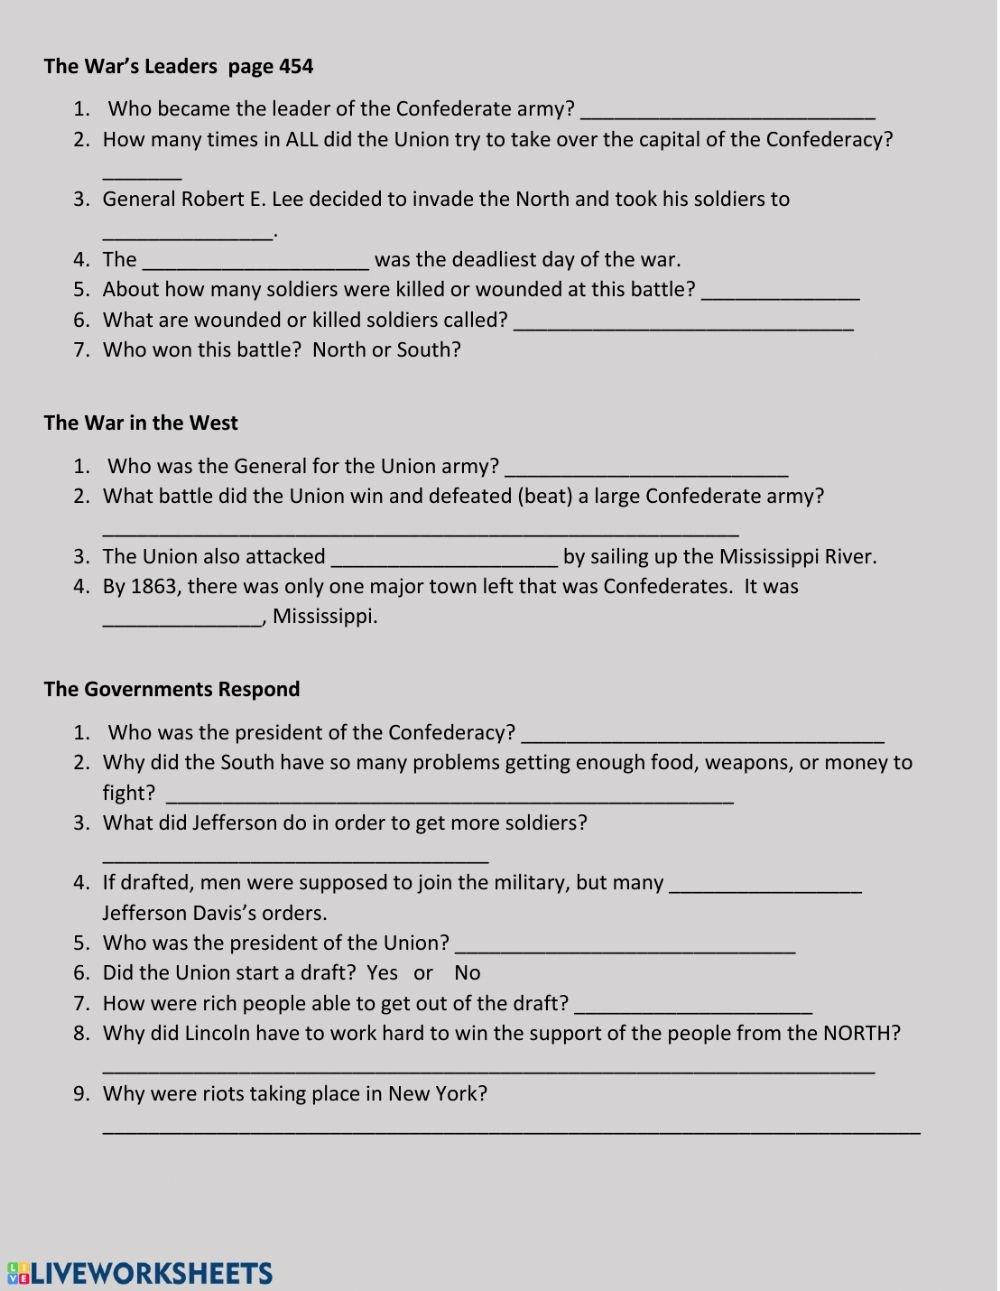 Civil War Worksheets 5th Grade Inspirational the War S Leaders Interactive Worksheet